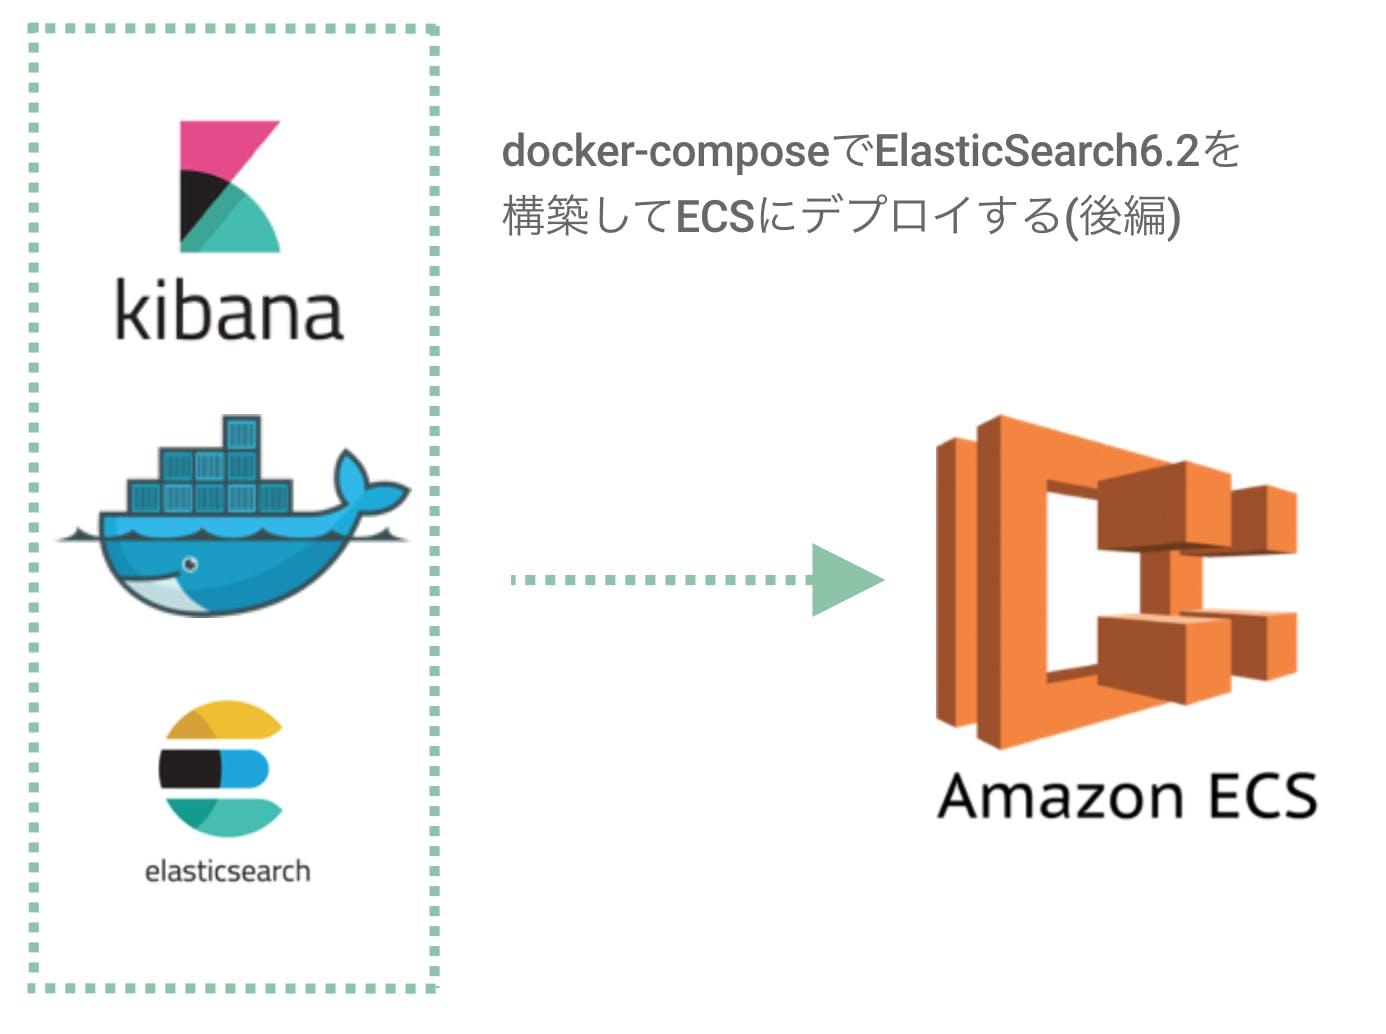 docker-composeでElasticSearch6 2を構築してECSにデプロイするまで(後編